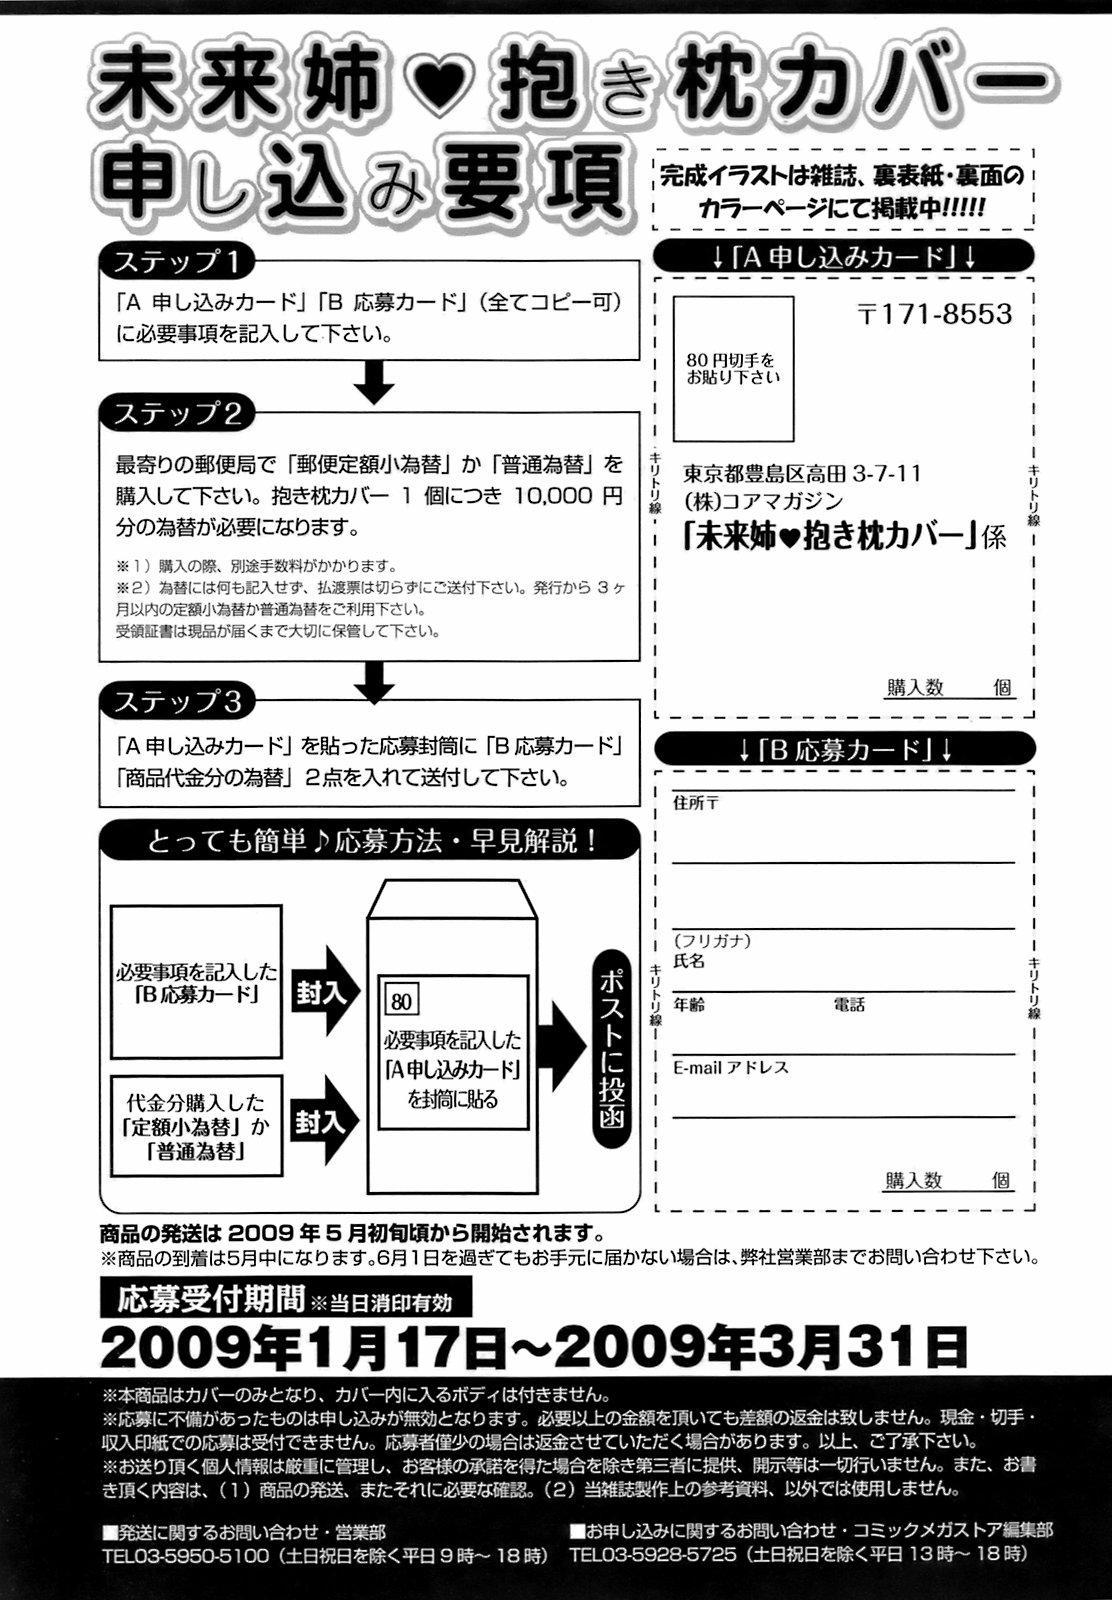 COMIC Megastore 2009-04 163